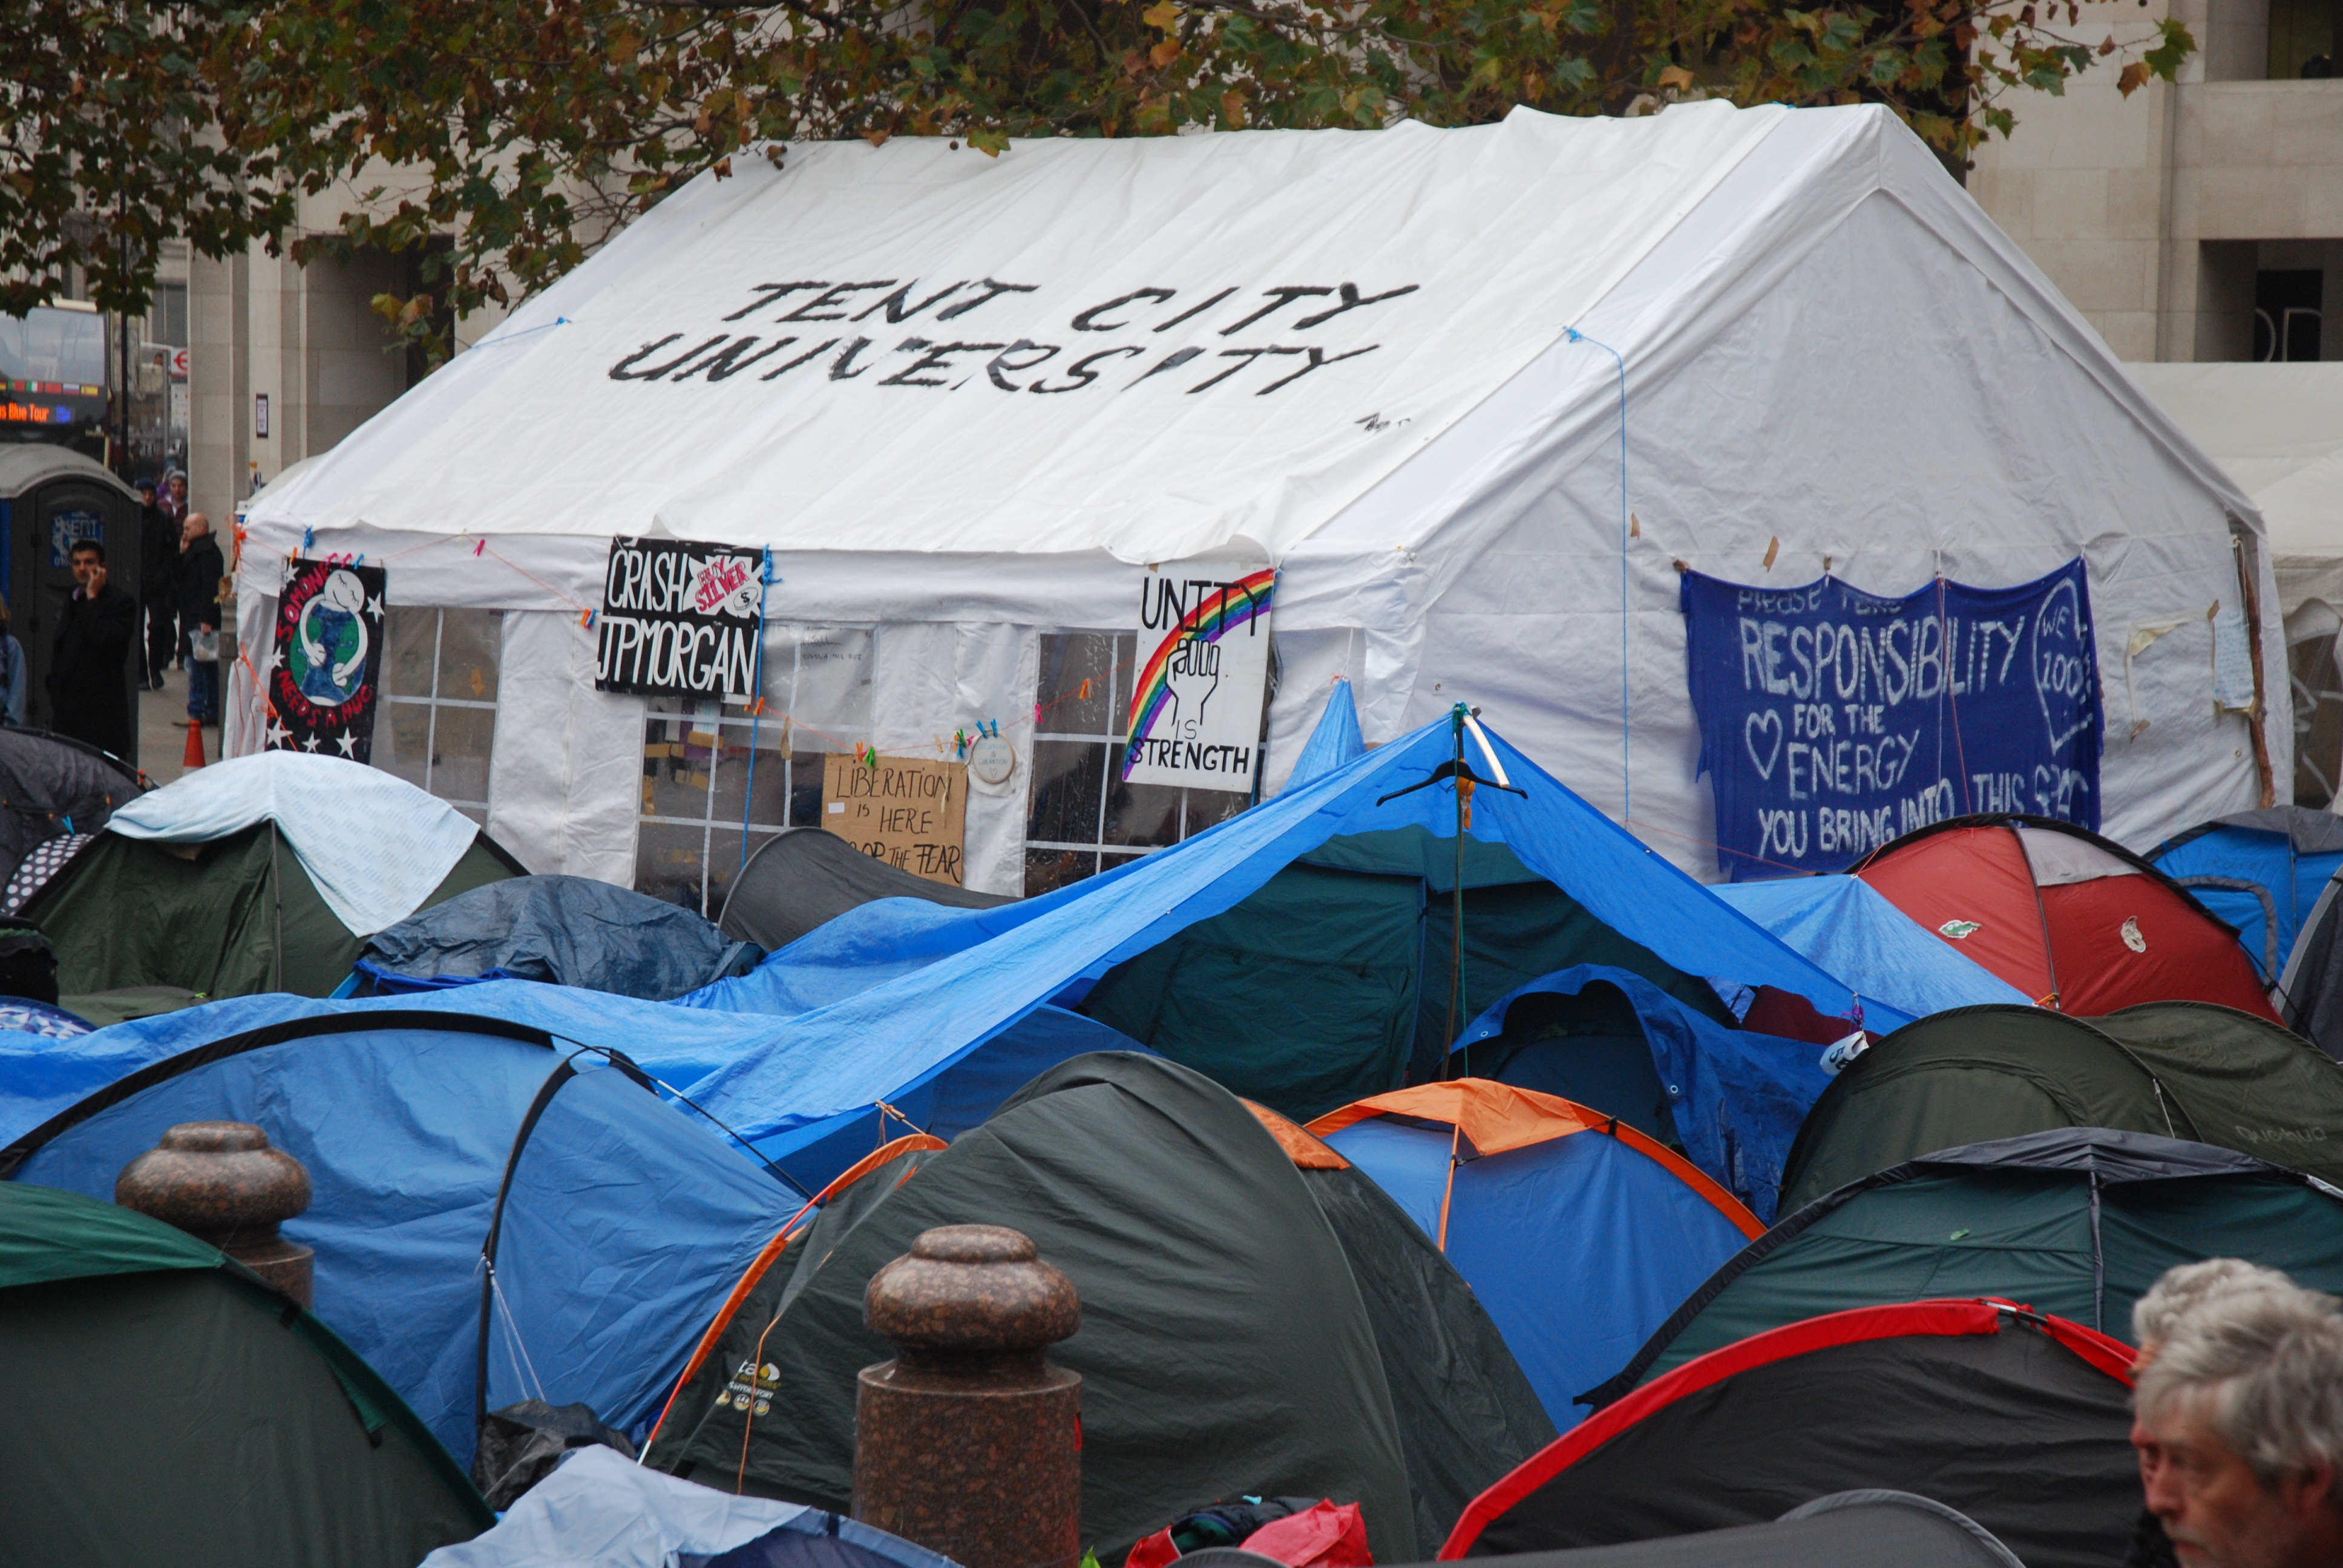 File:Occupy London Tent City University.jpg - Wikimedia Commons